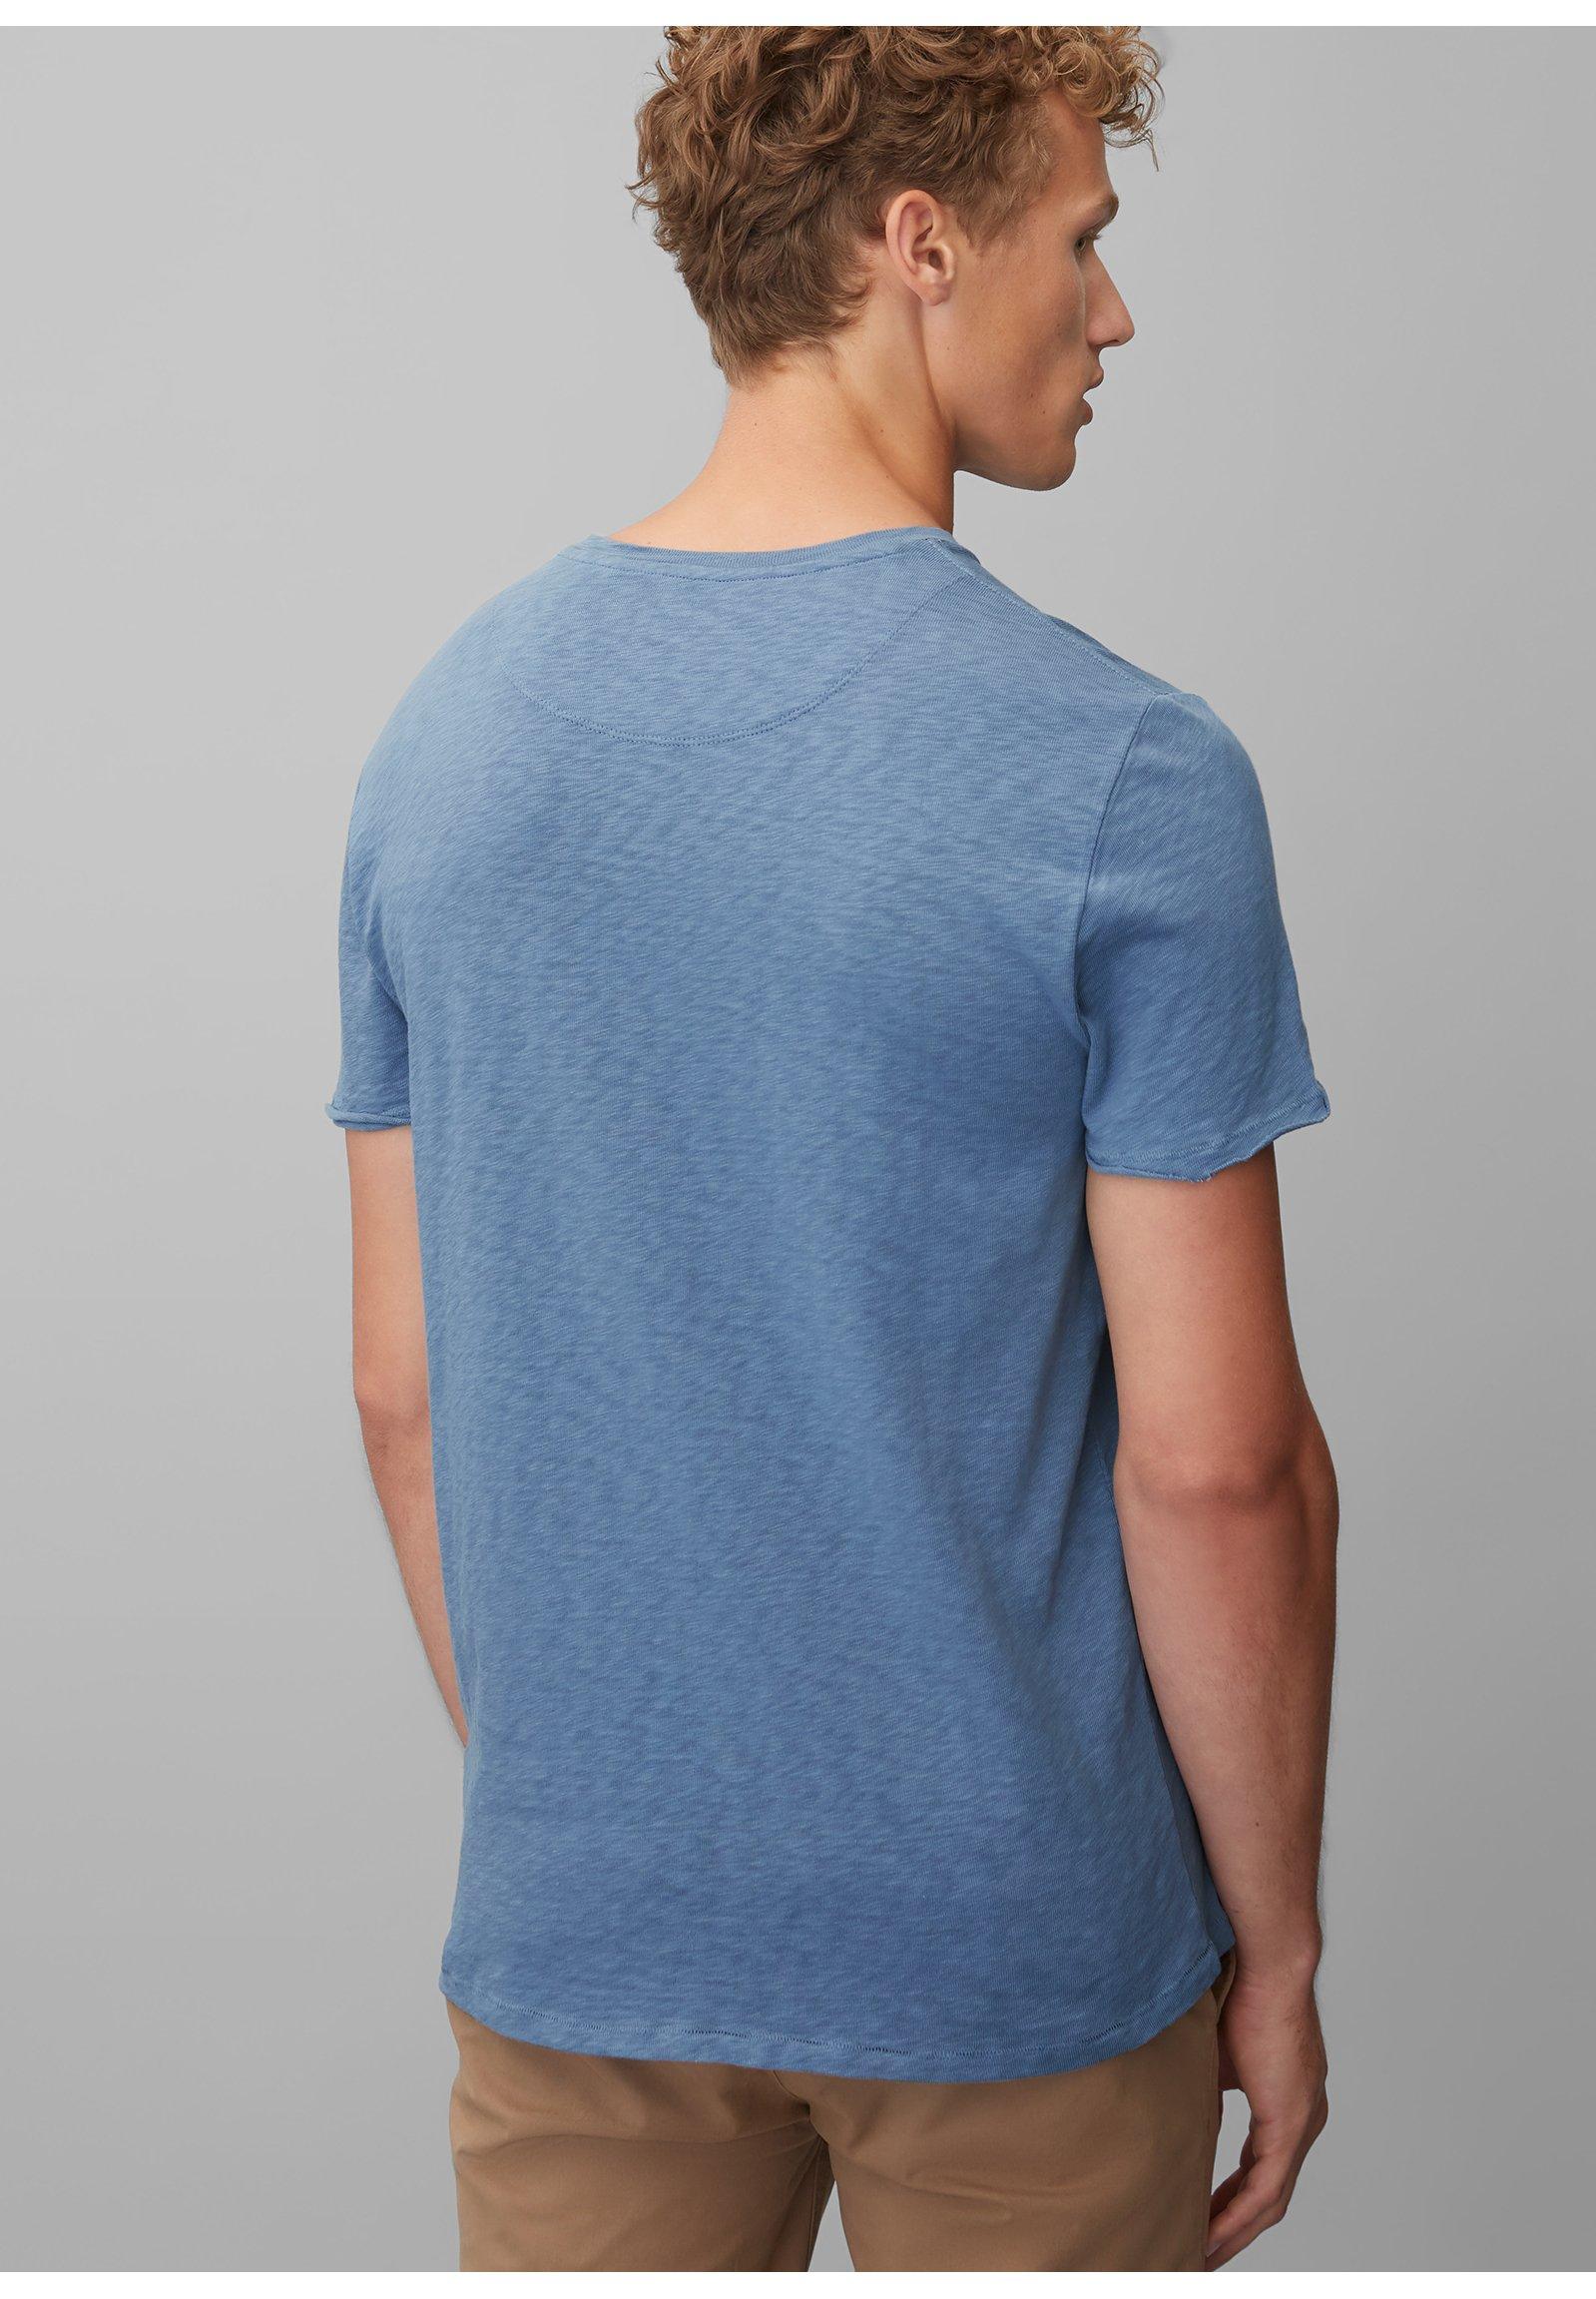 Marc OPolo DENIM T-Shirt basic - blue fantasy/blau - Herrenbekleidung 7gZEp